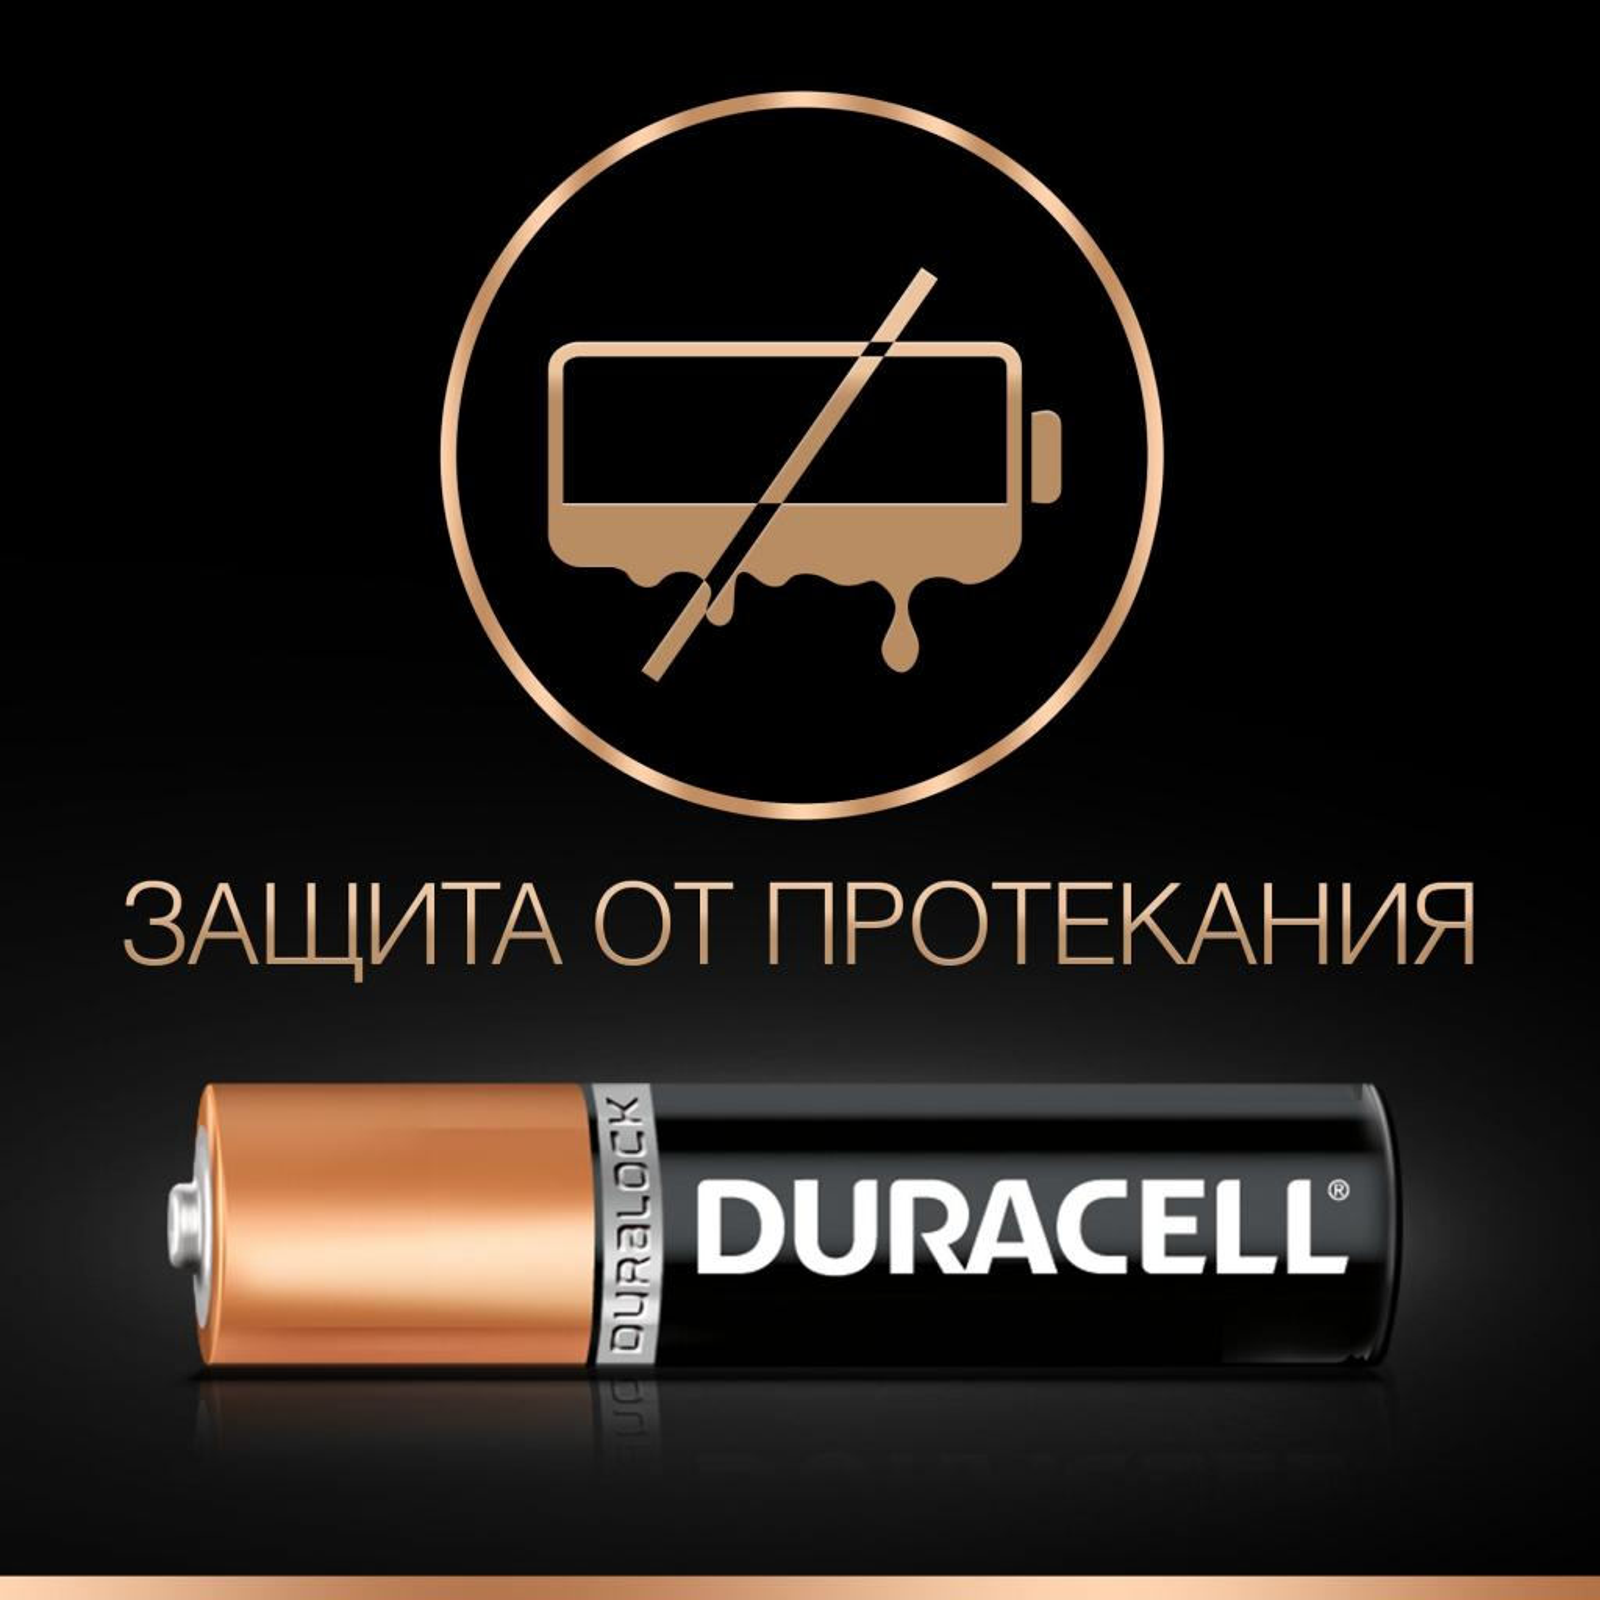 Батарейка Duracell AAA MN2400 LR03 * 2 (5000394058170 / 81484984) изображение 4